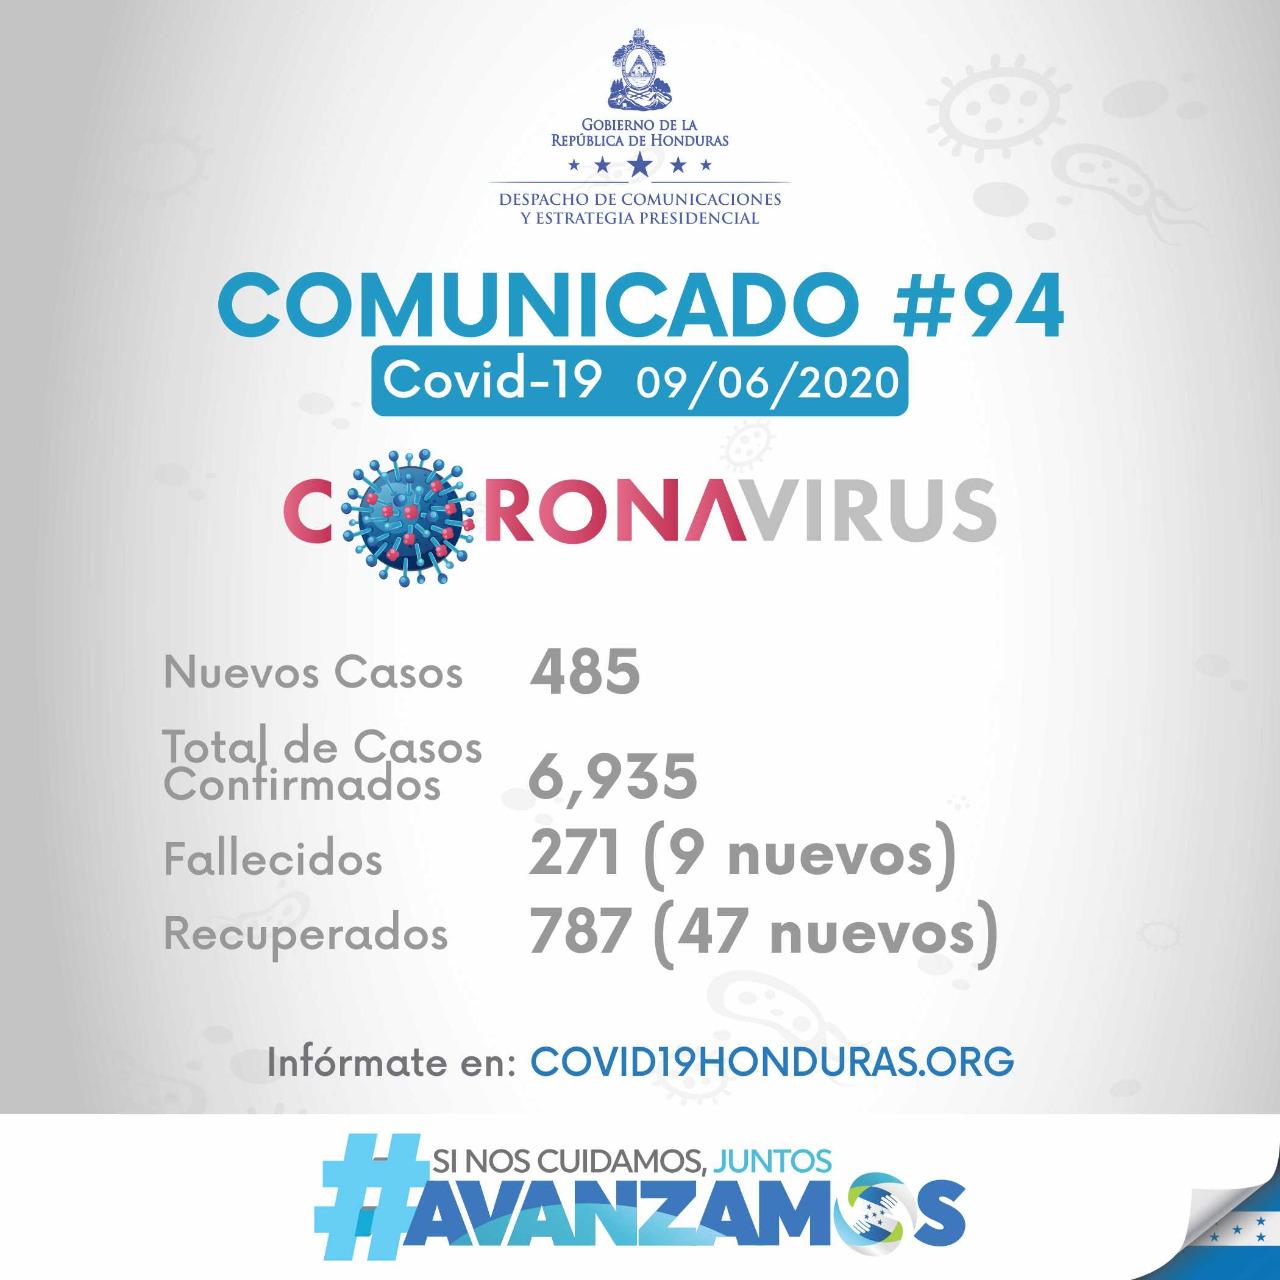 SINAGER reporta 485 nuevos casos de coronavirus en Honduras. Un total de 6,935 contagiados